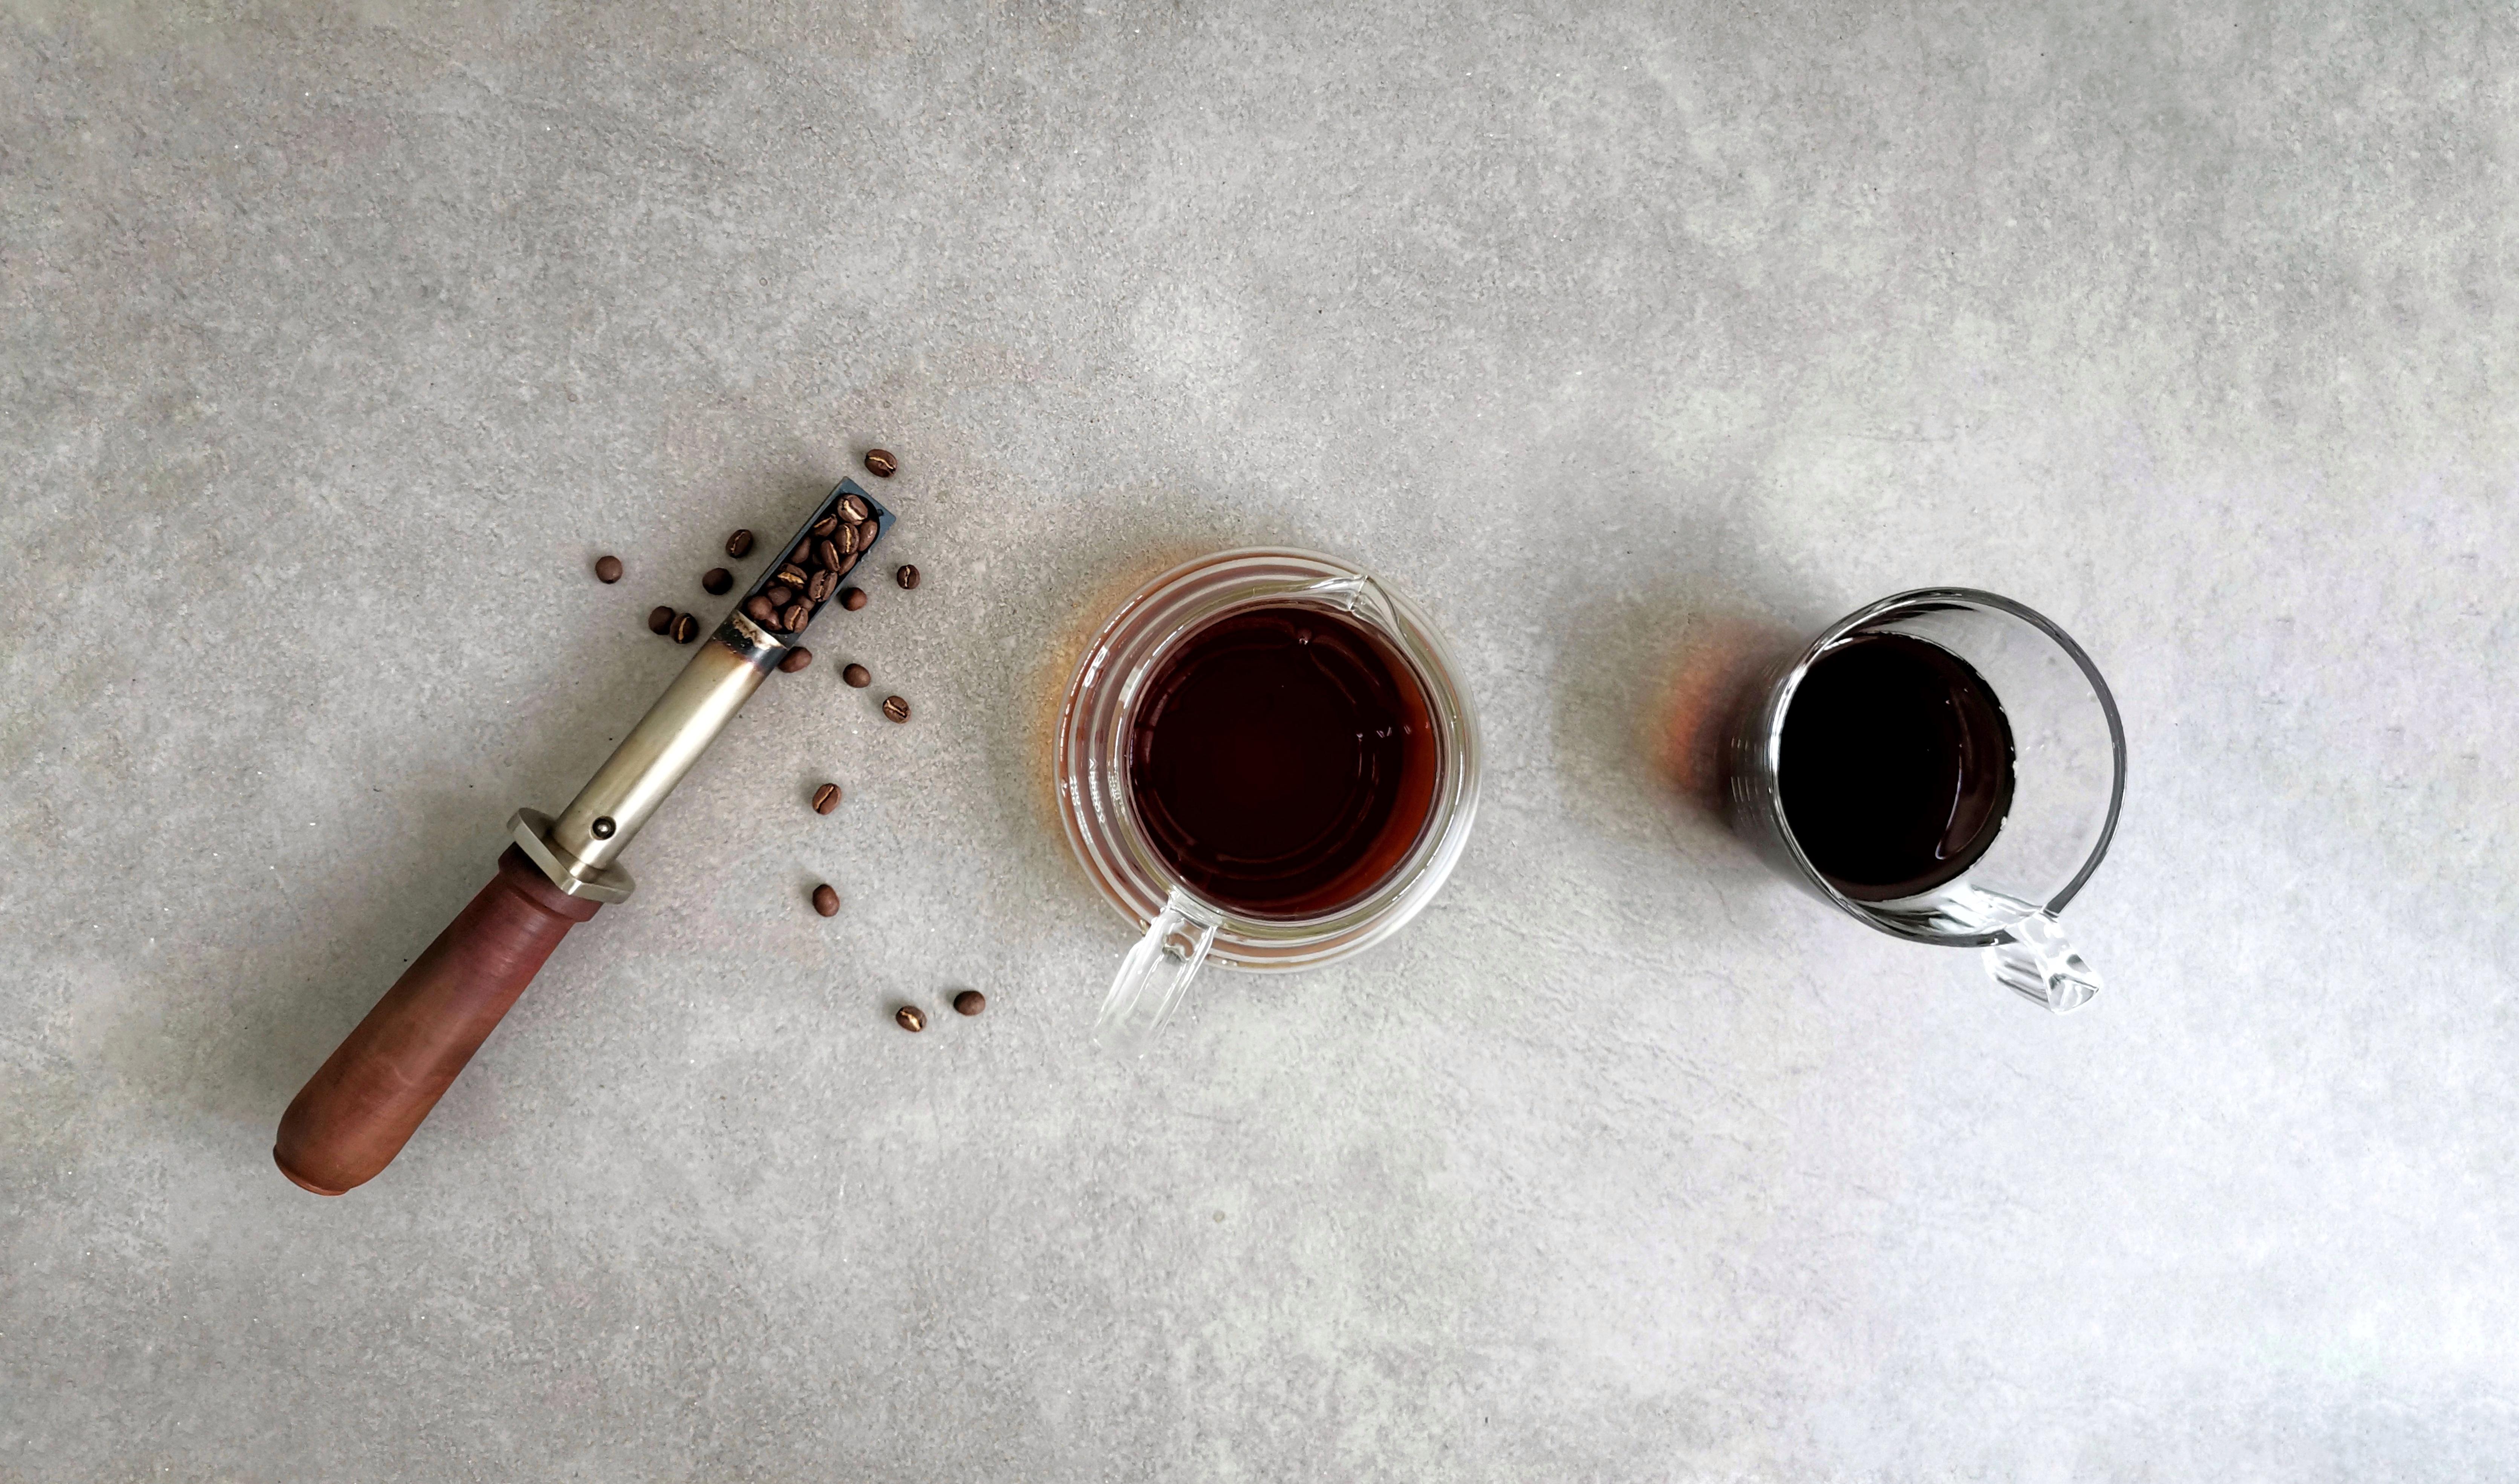 ABeans Roastery | Your Neighborhood Coffee Roastery